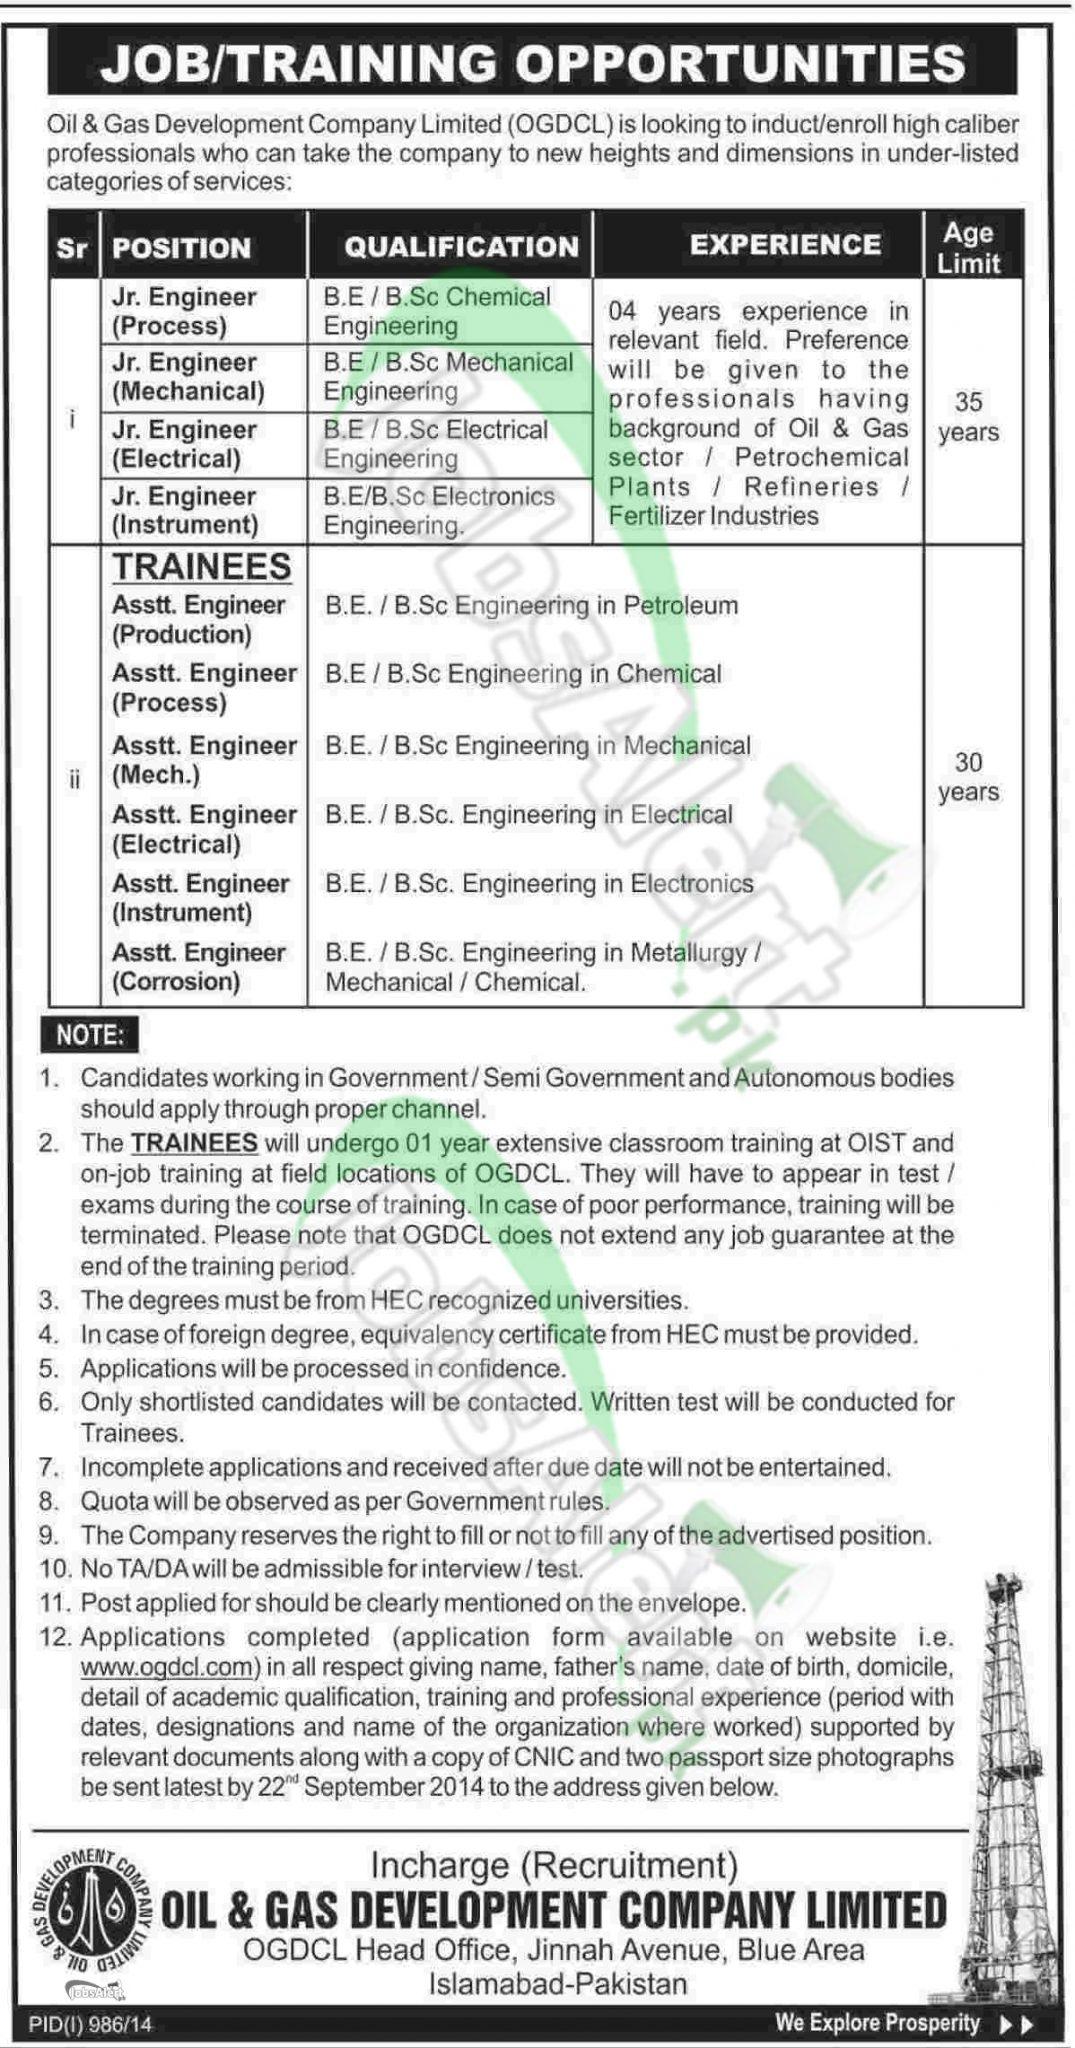 (OGDCL) Oil & Gas Development Company Ltd